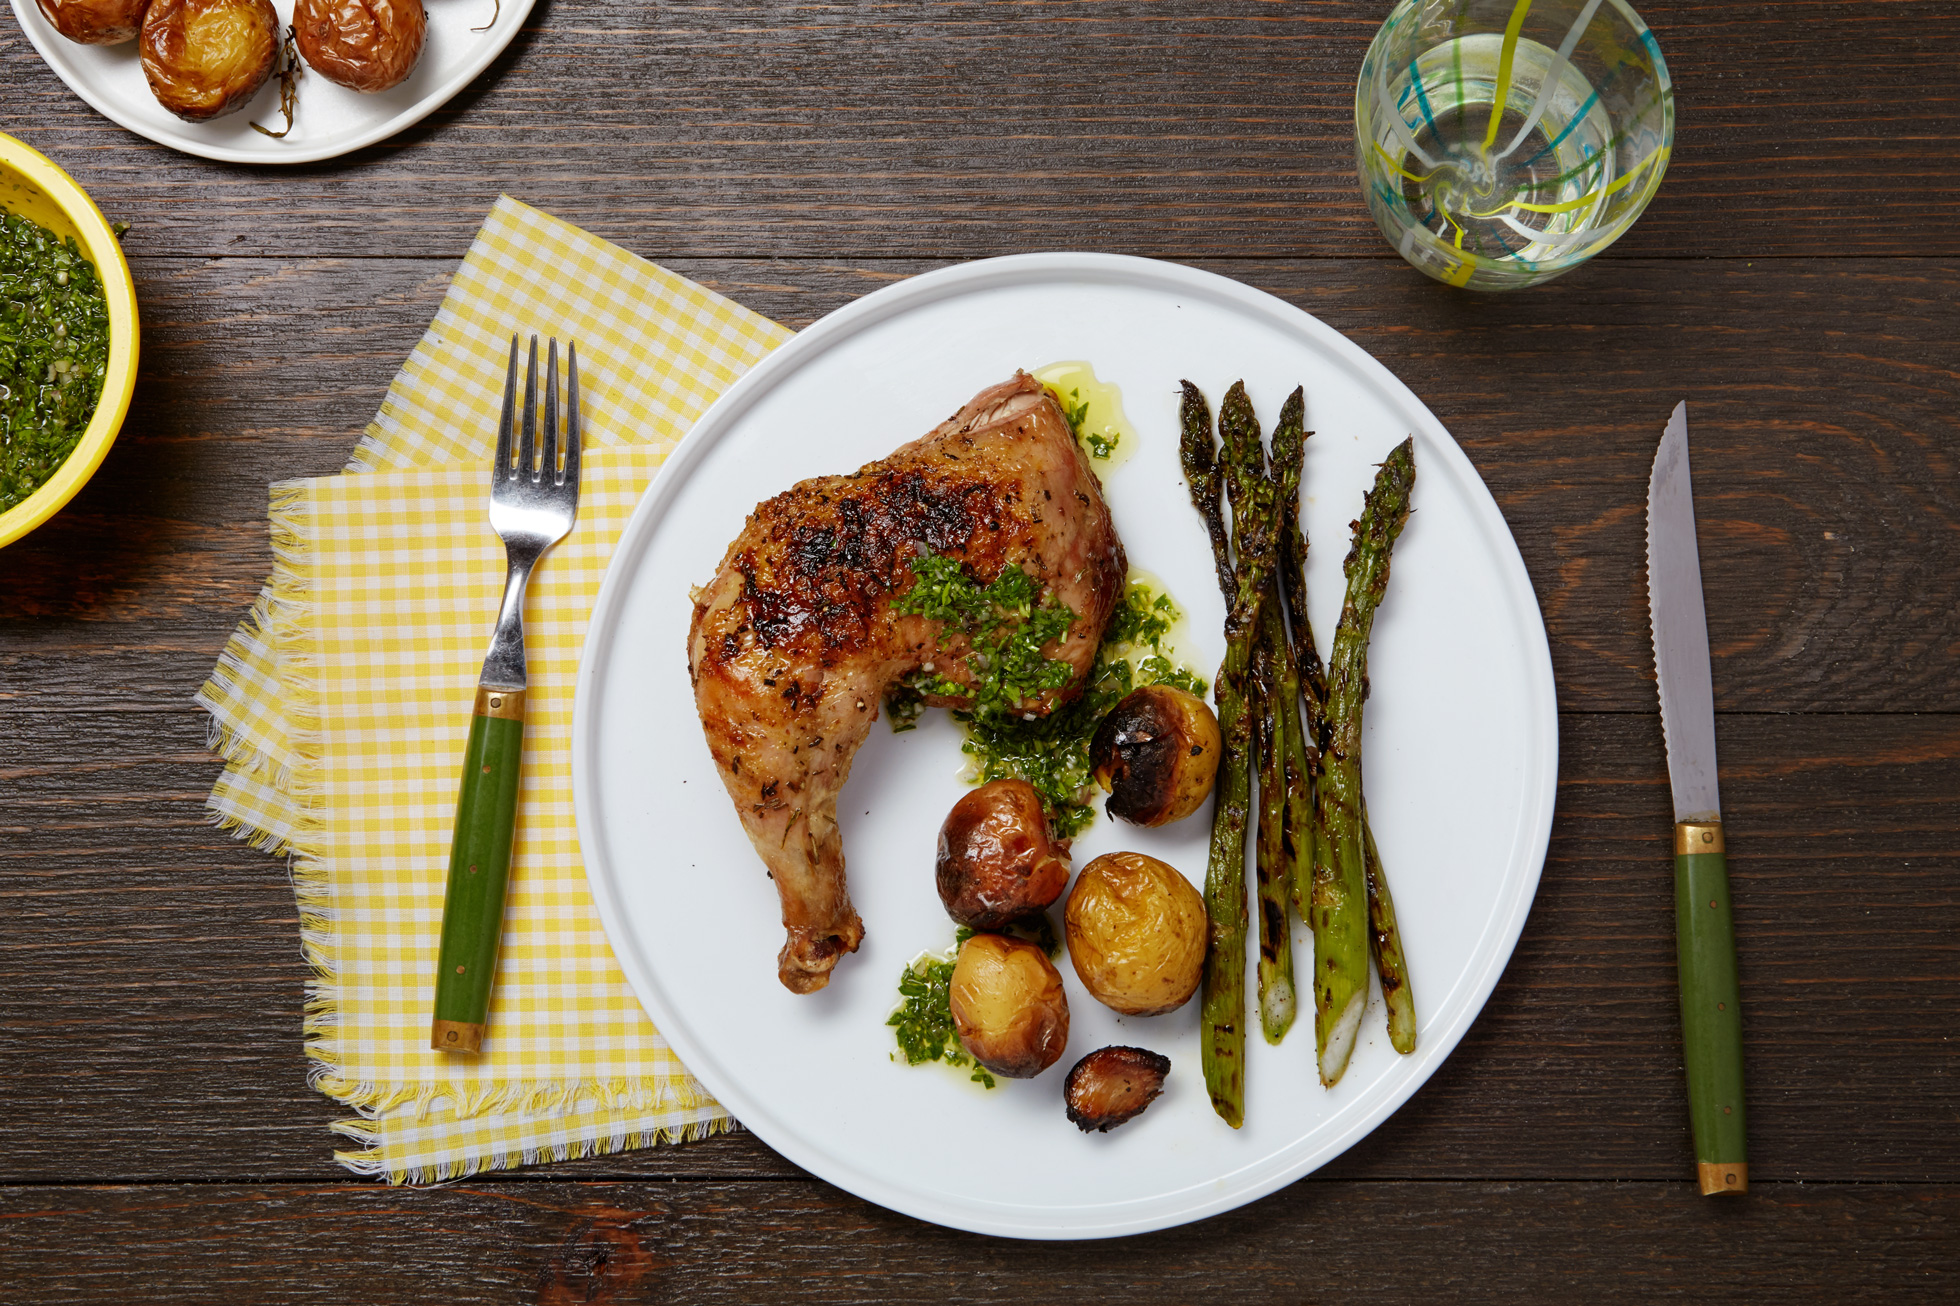 GrillingGroceryBagInset-ChickenPotatoAsparagus.jpg